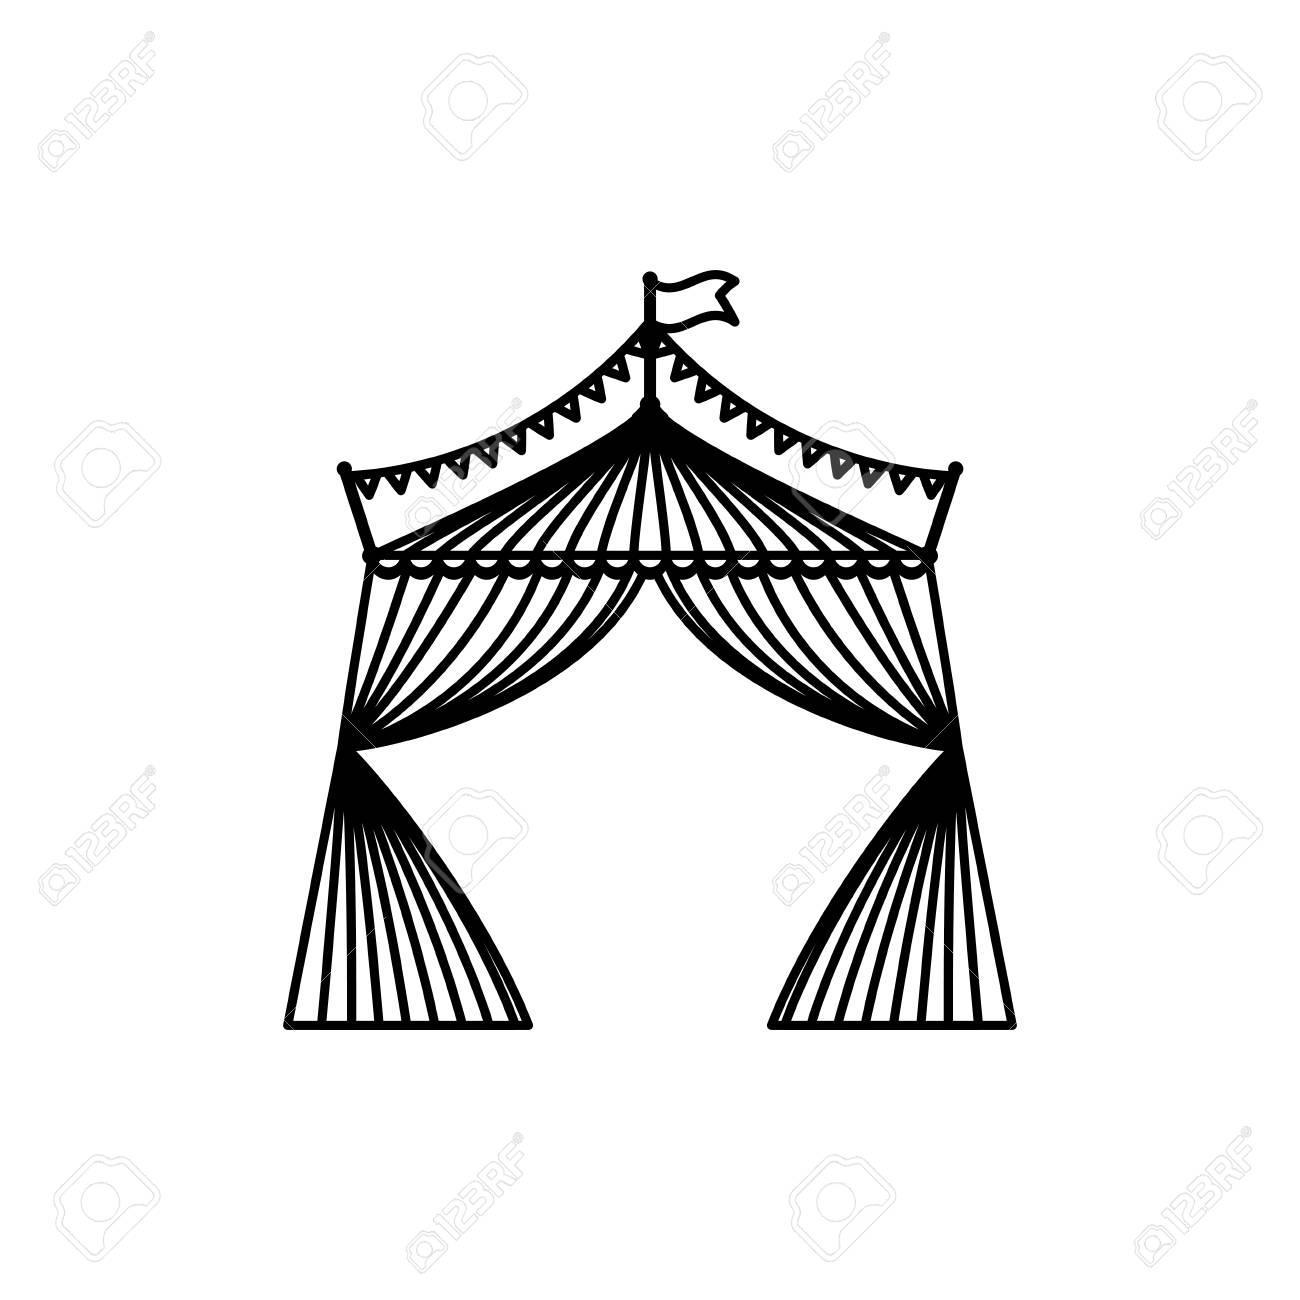 Circus tent festival icon vector illustration graphic design Stock Vector - 69085056  sc 1 st  123RF.com & Circus Tent Festival Icon Vector Illustration Graphic Design ...